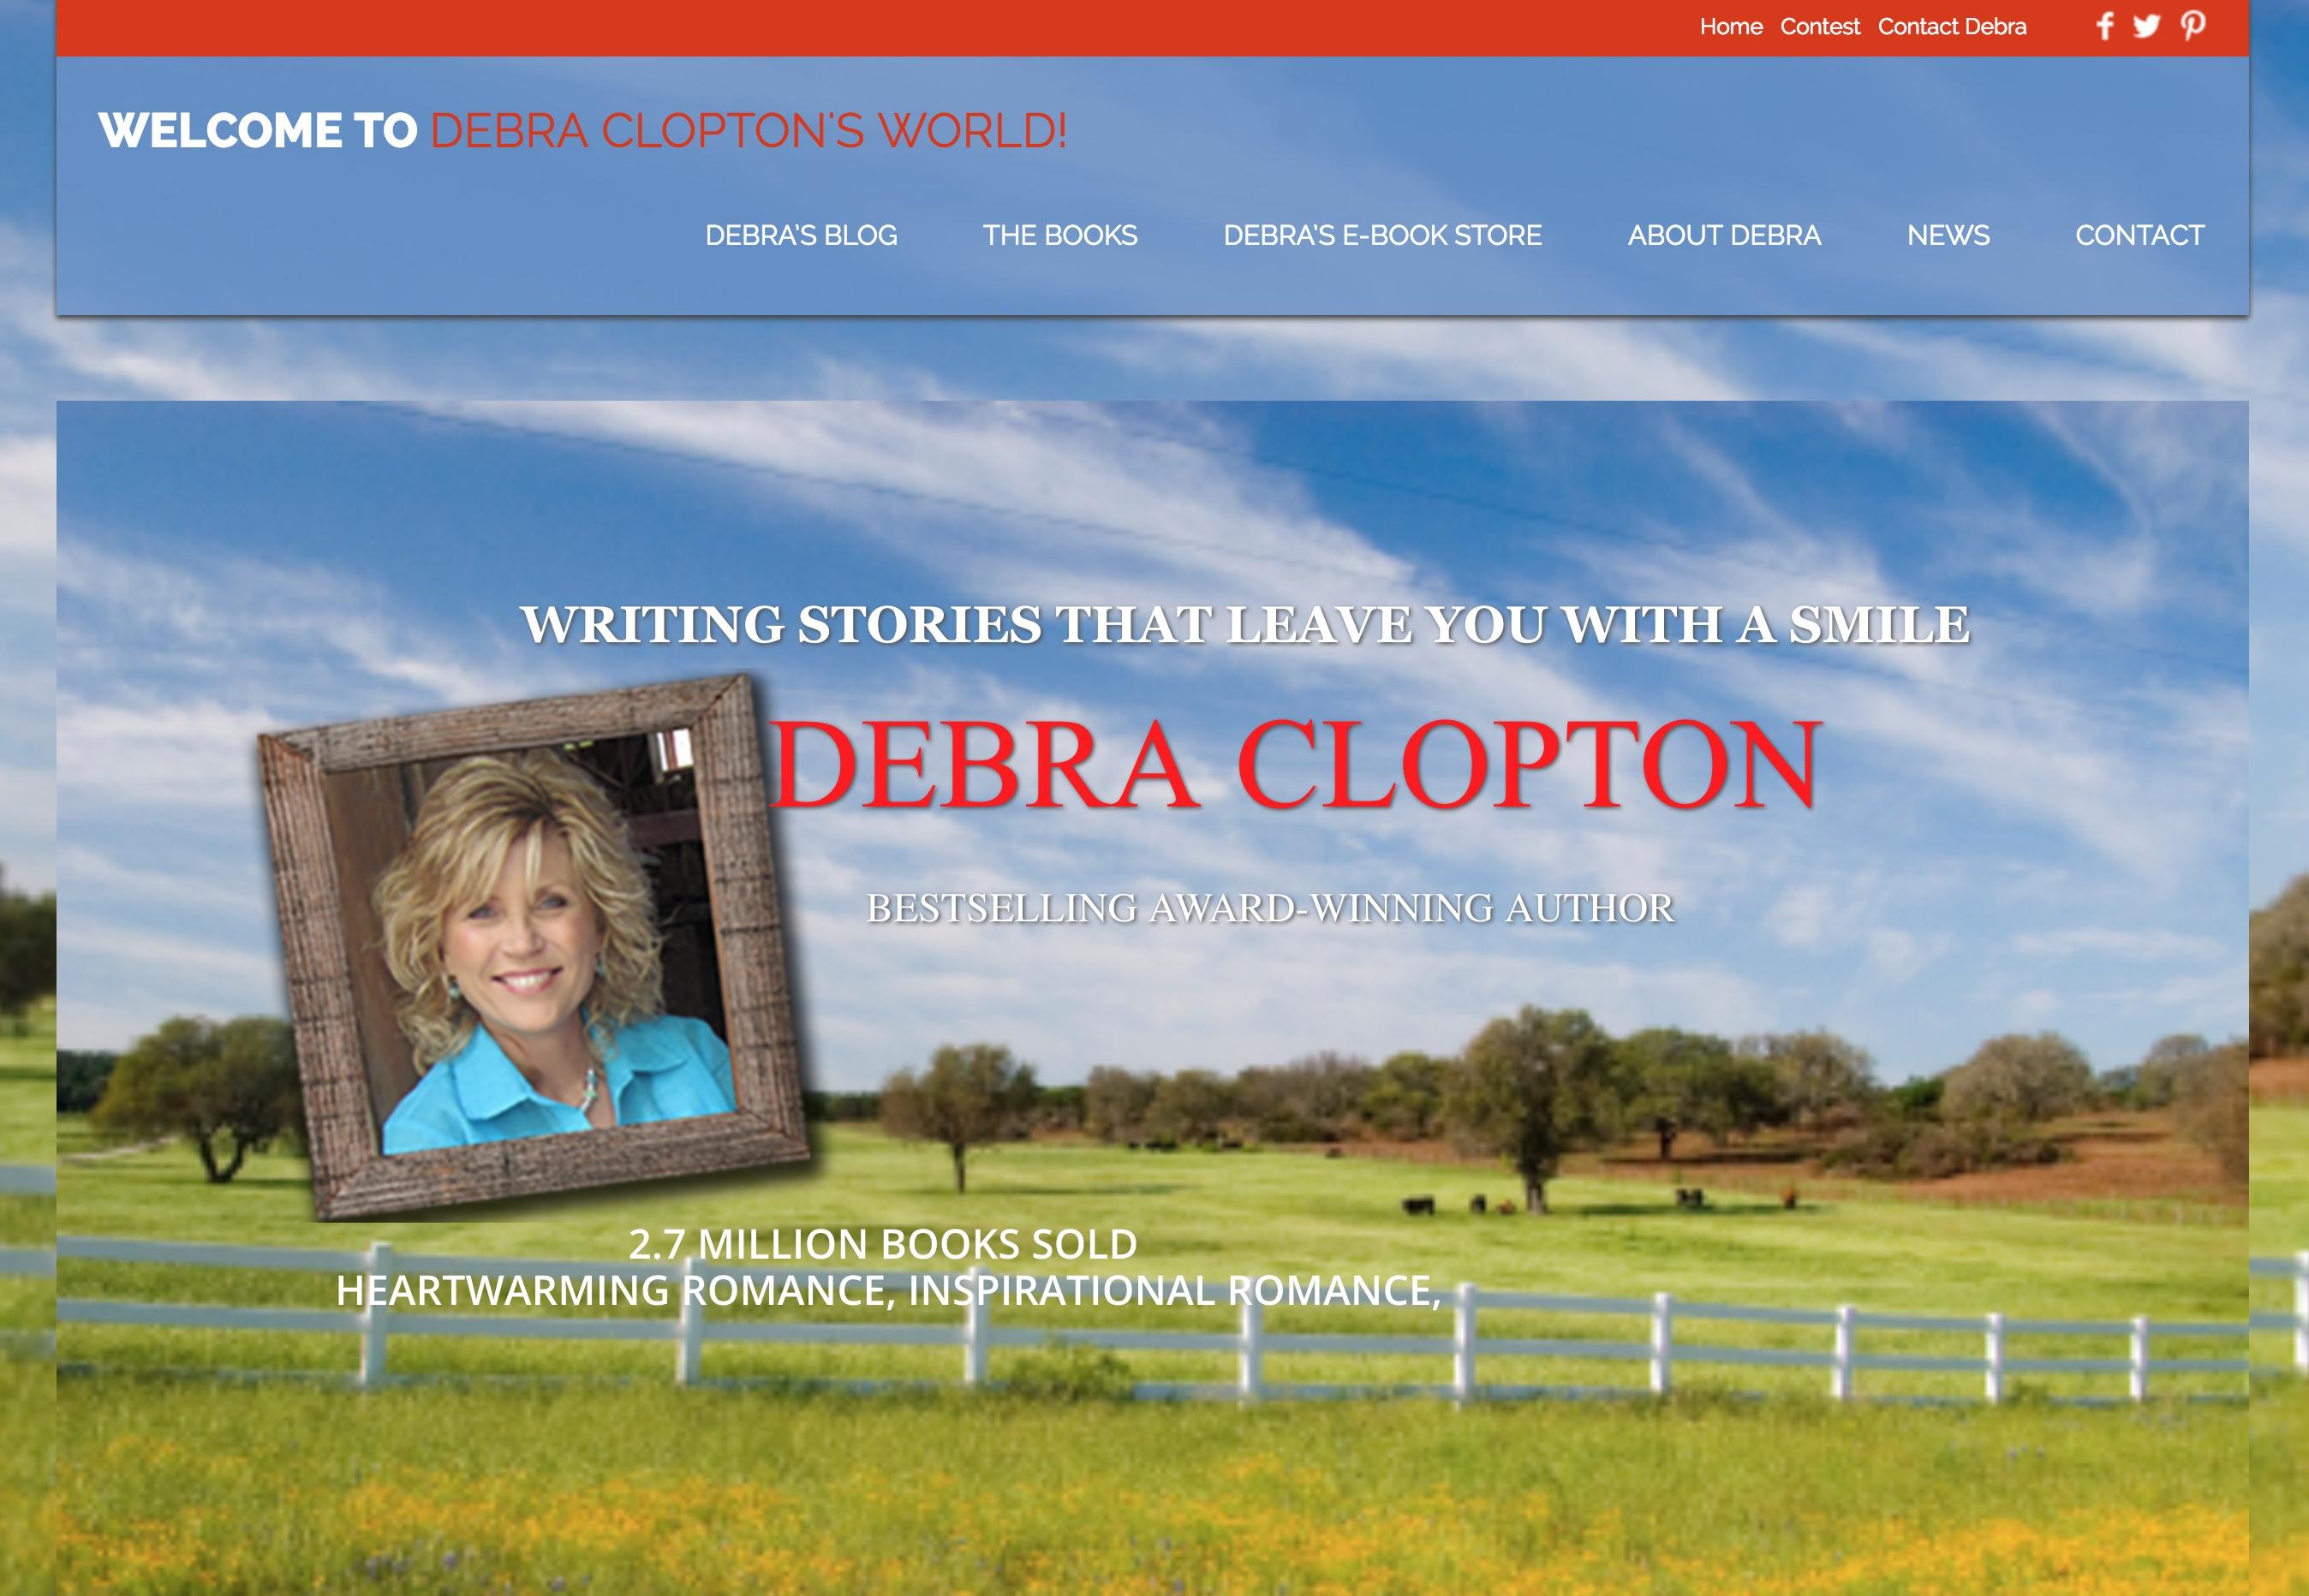 Debra Clopton's author website